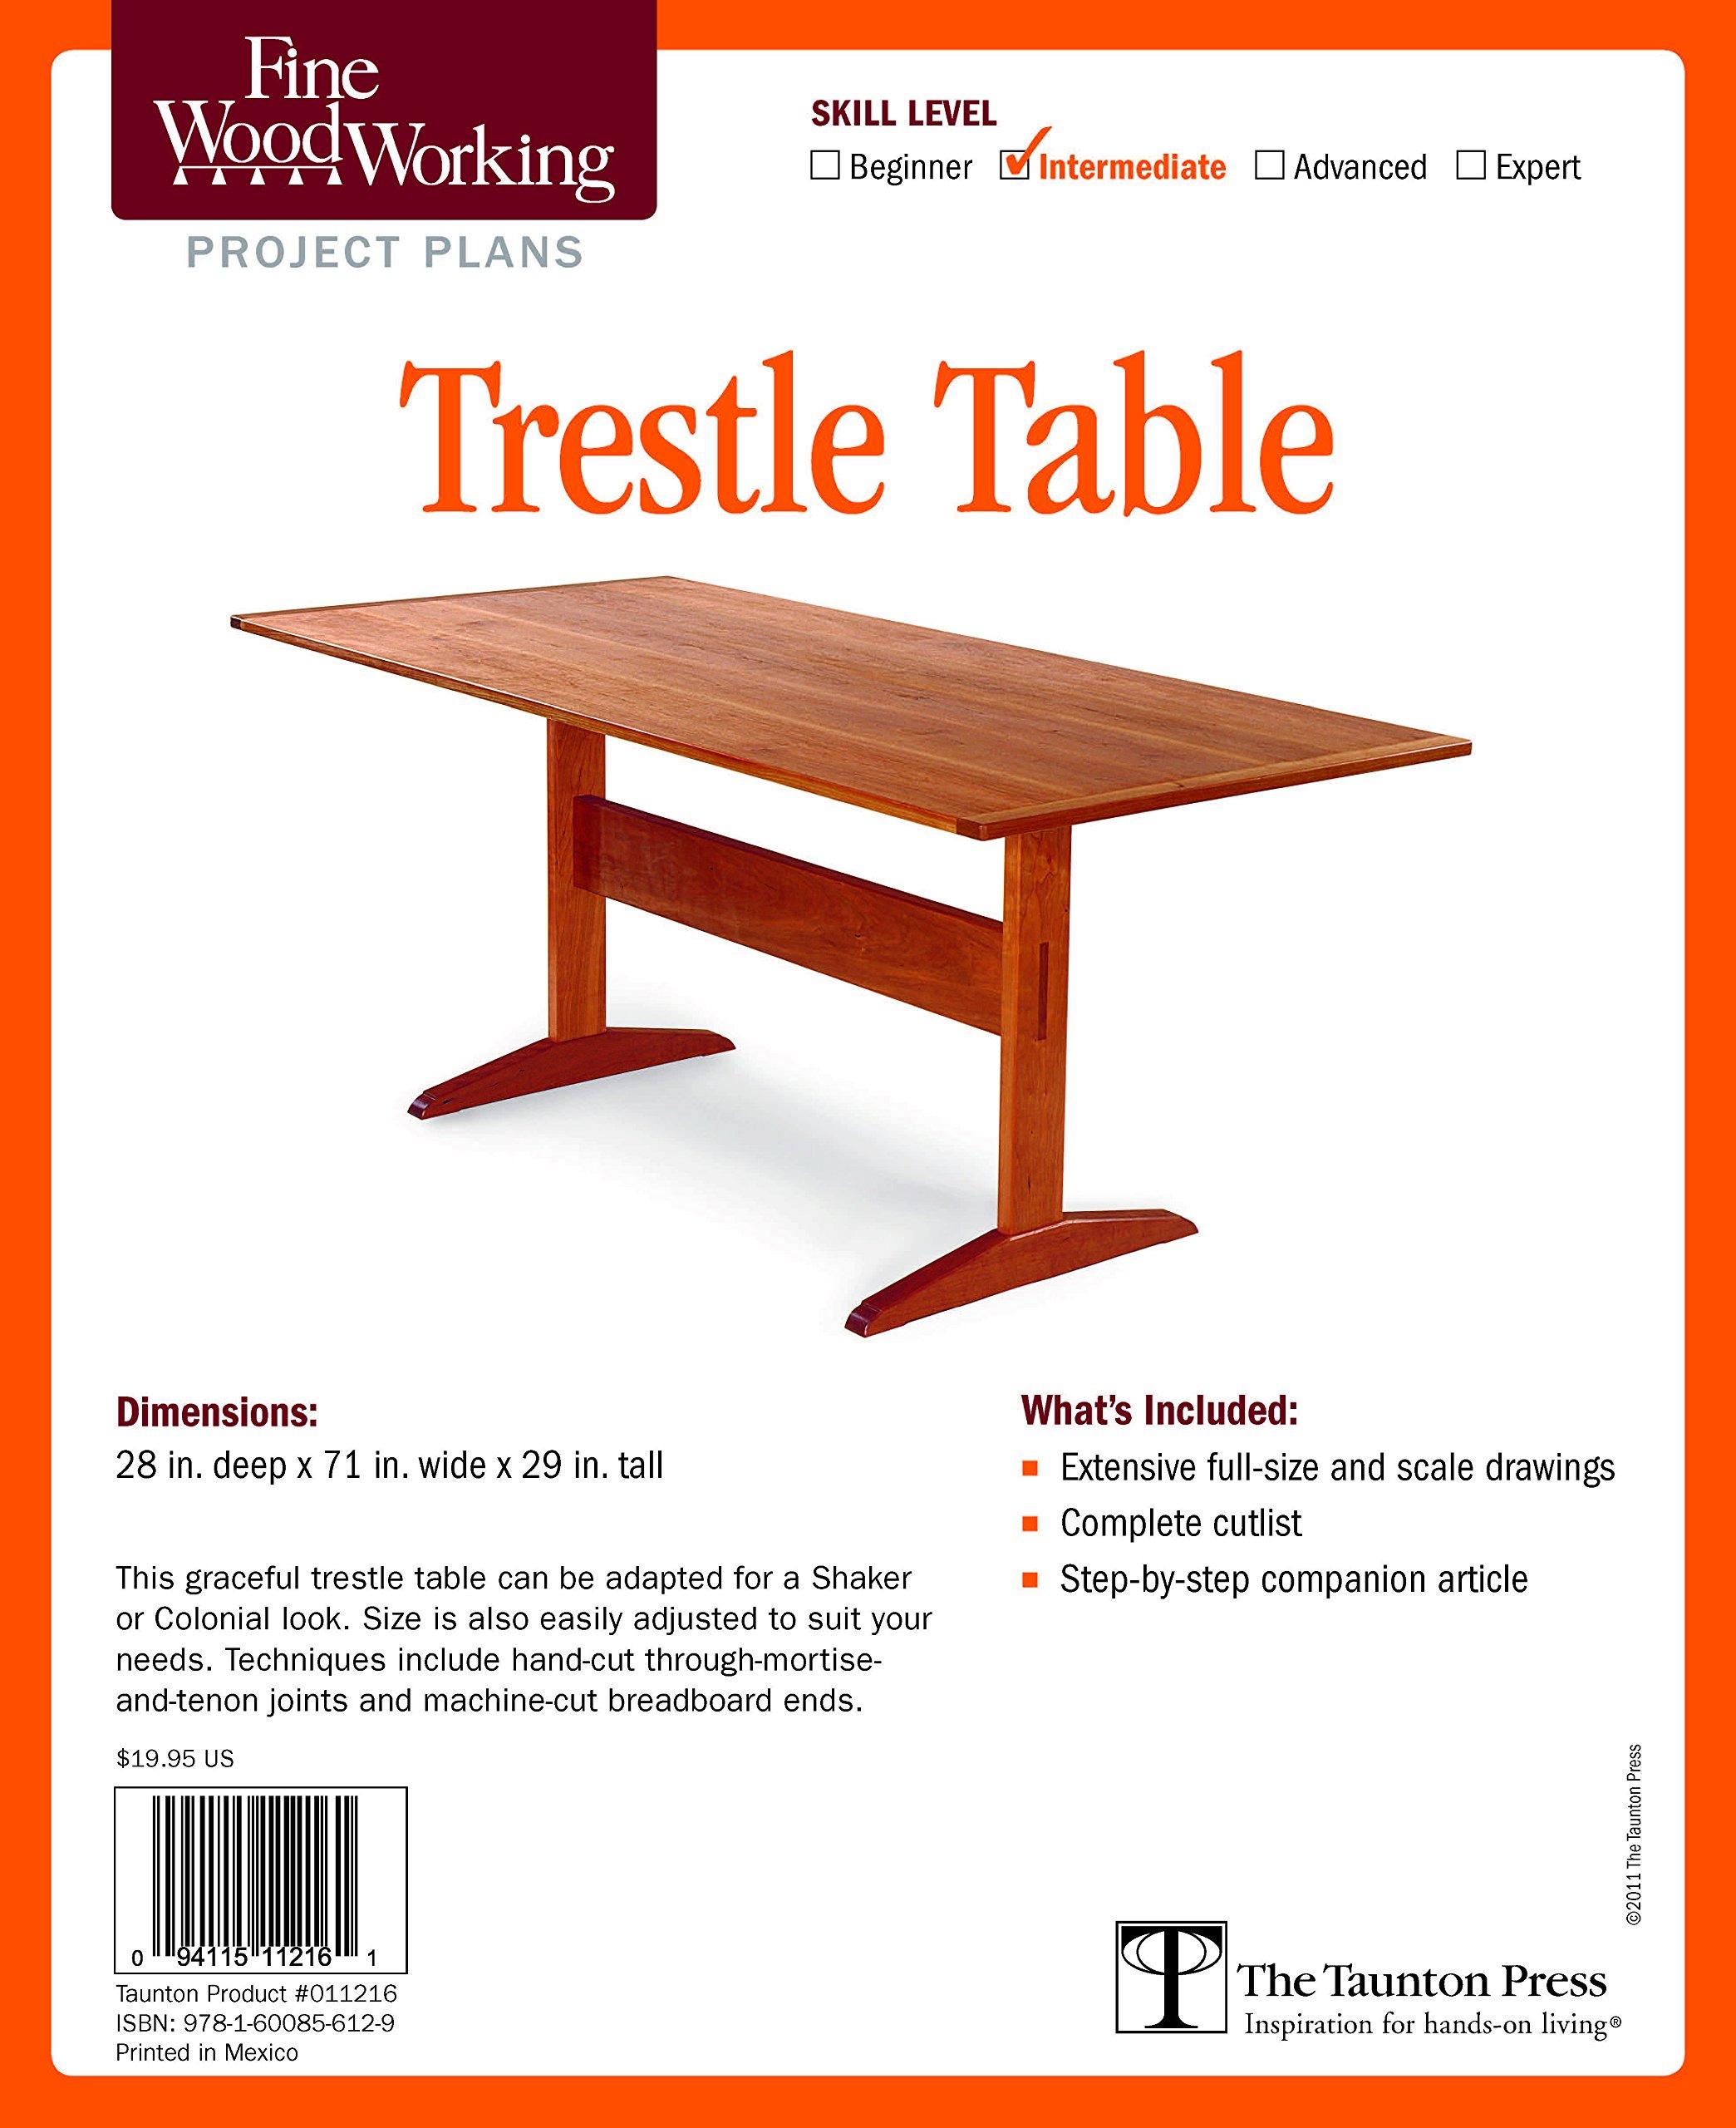 Fine Woodworking S Trestle Table Plan Editors Of 9781600856129 Amazon Com Books